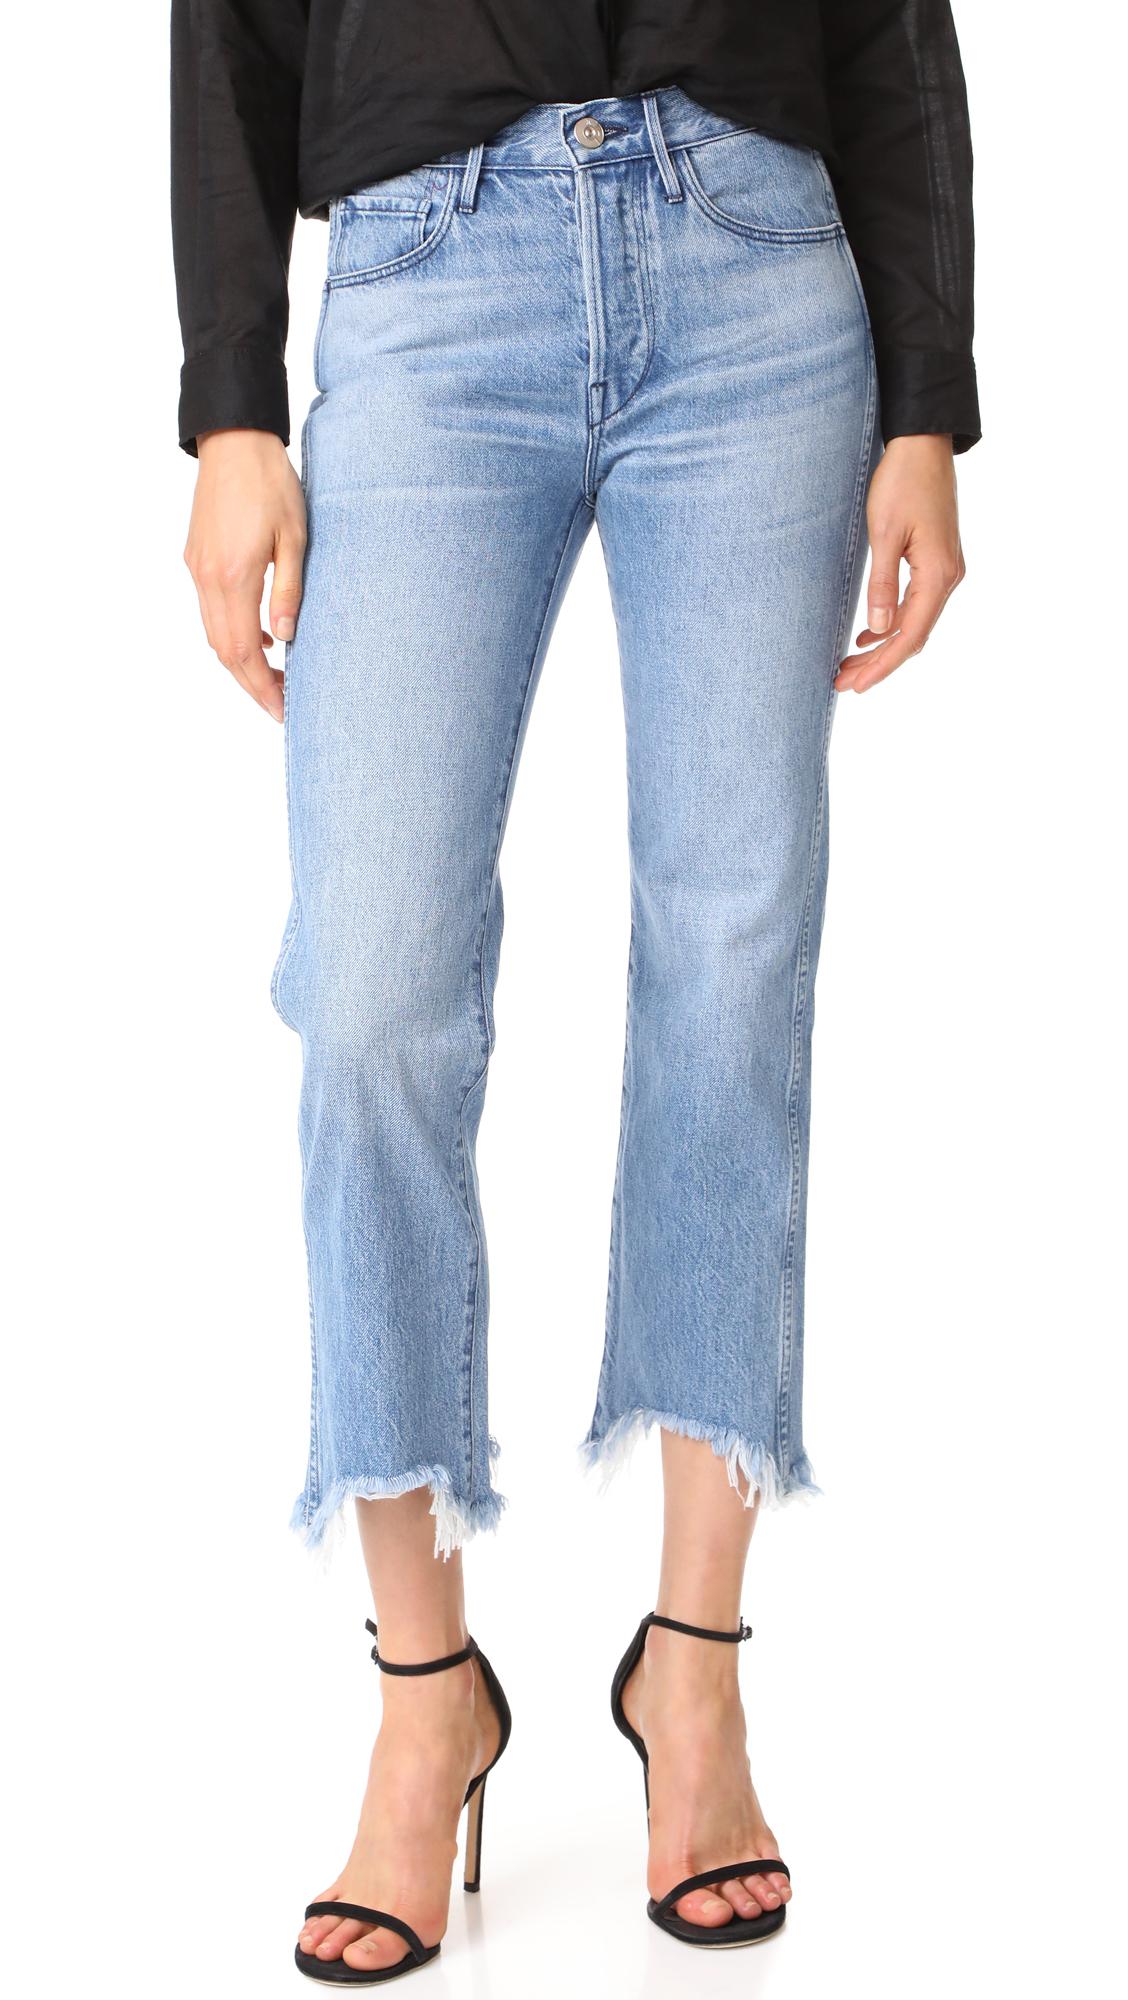 3x1 Shelter Austin Crop Jeans - Byrd